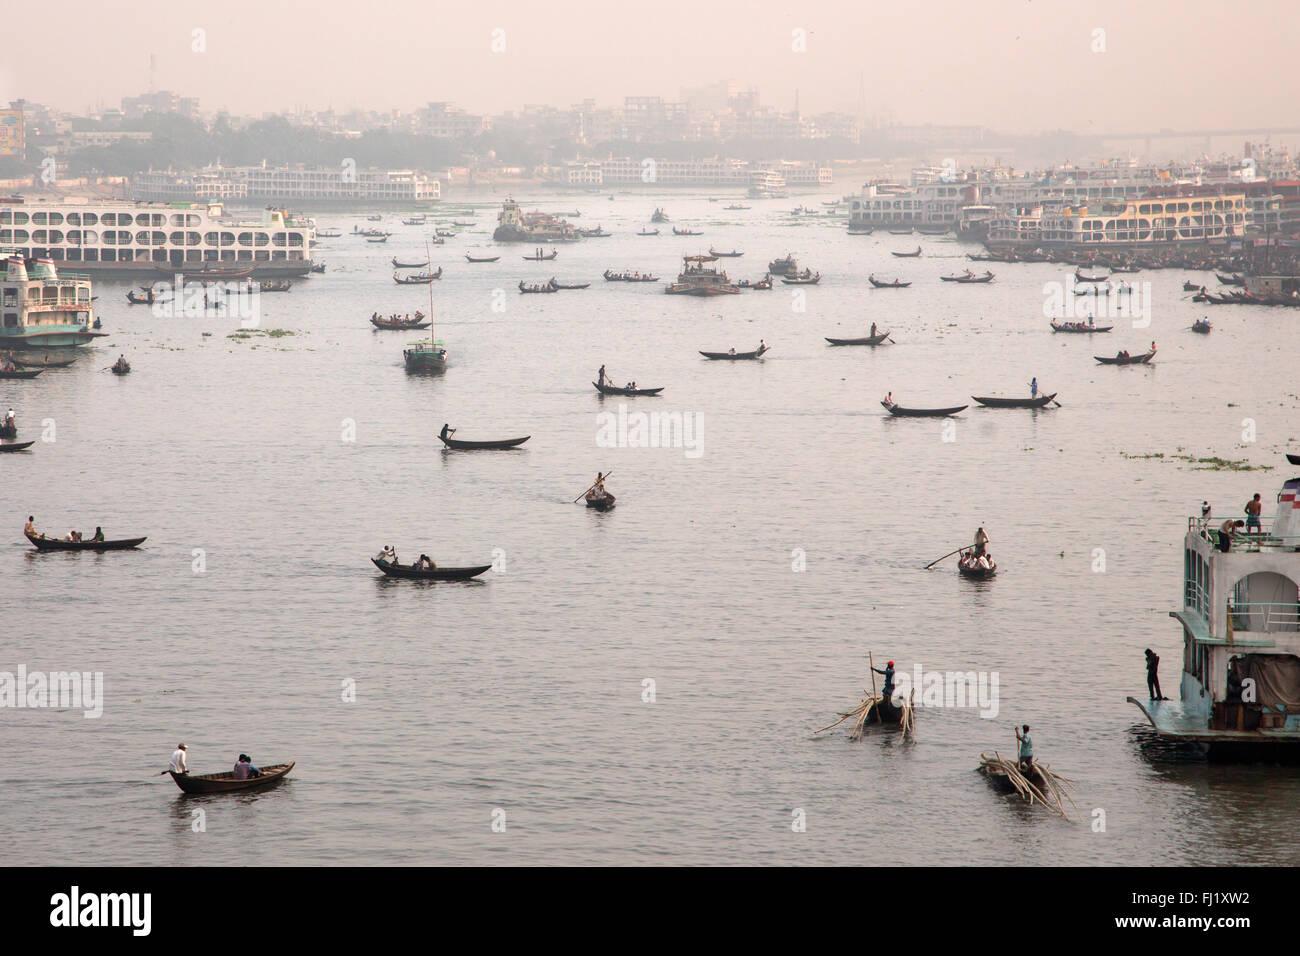 Sadarghat harbor - Dhaka, Bangladesh  - landscape with boats - Stock Image